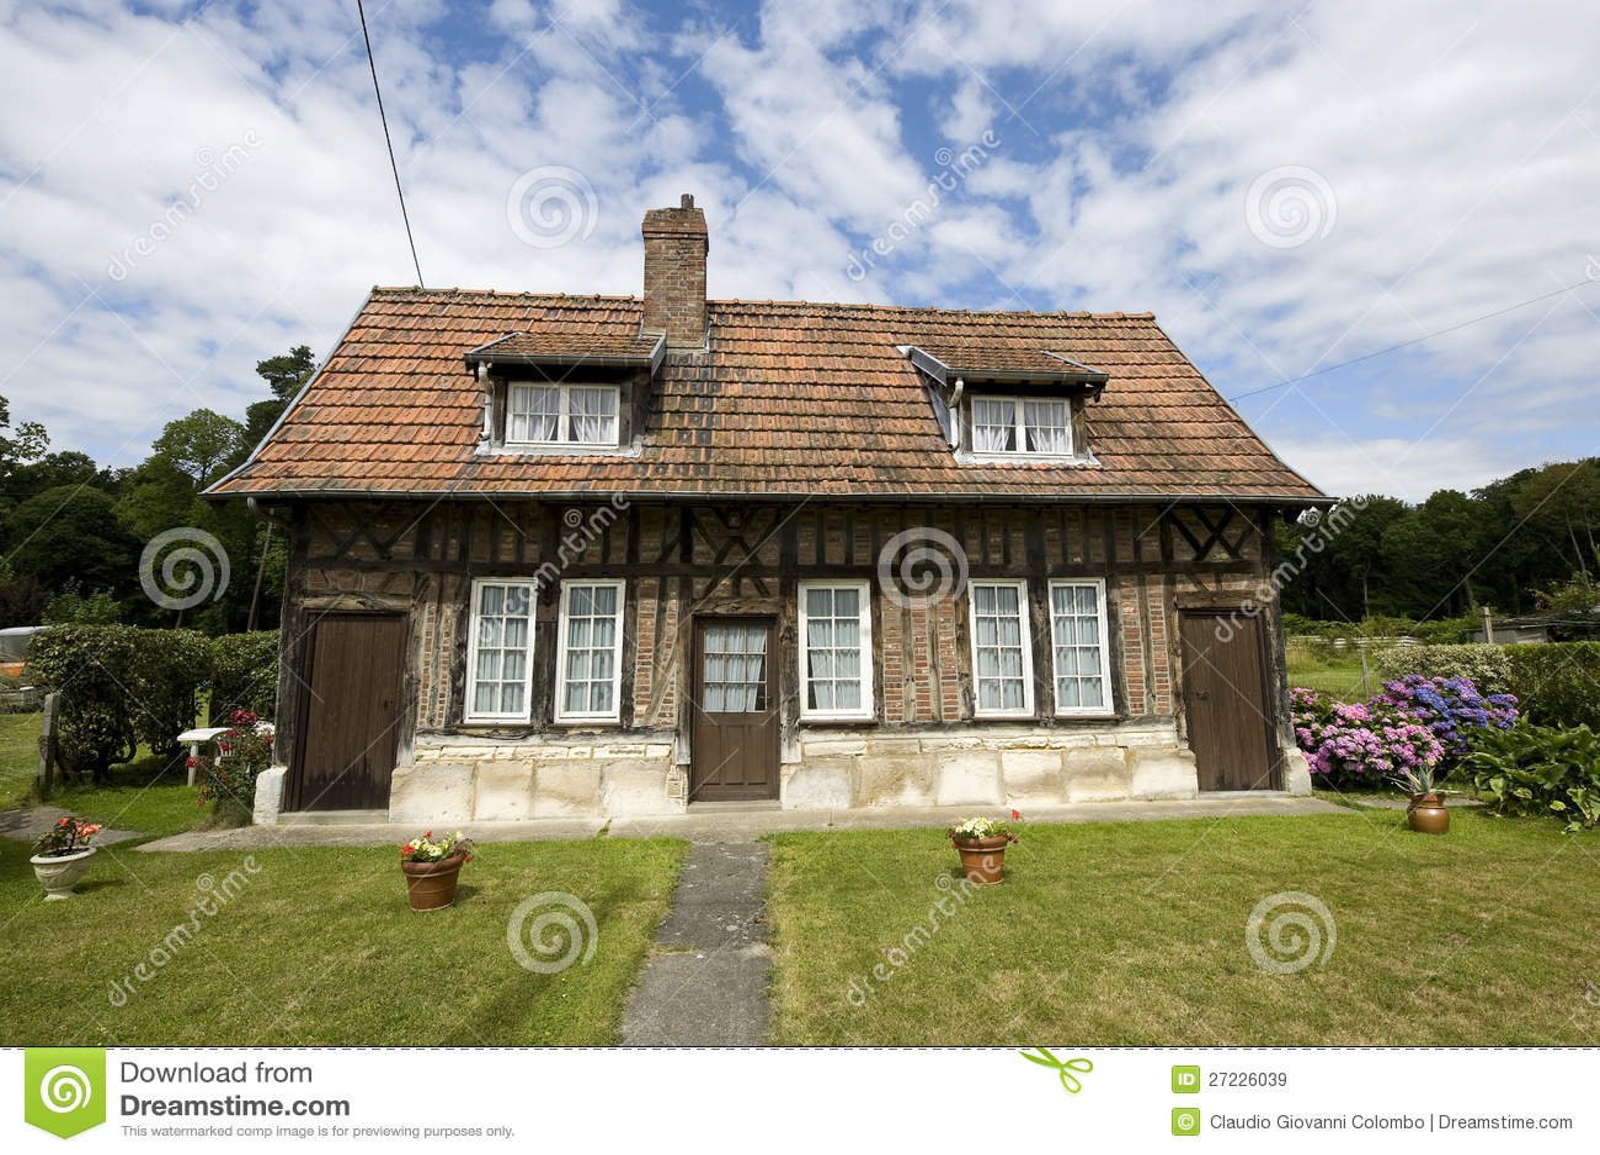 Normandy country house stock image image of facade - Pavimentazione esterna casa di campagna ...